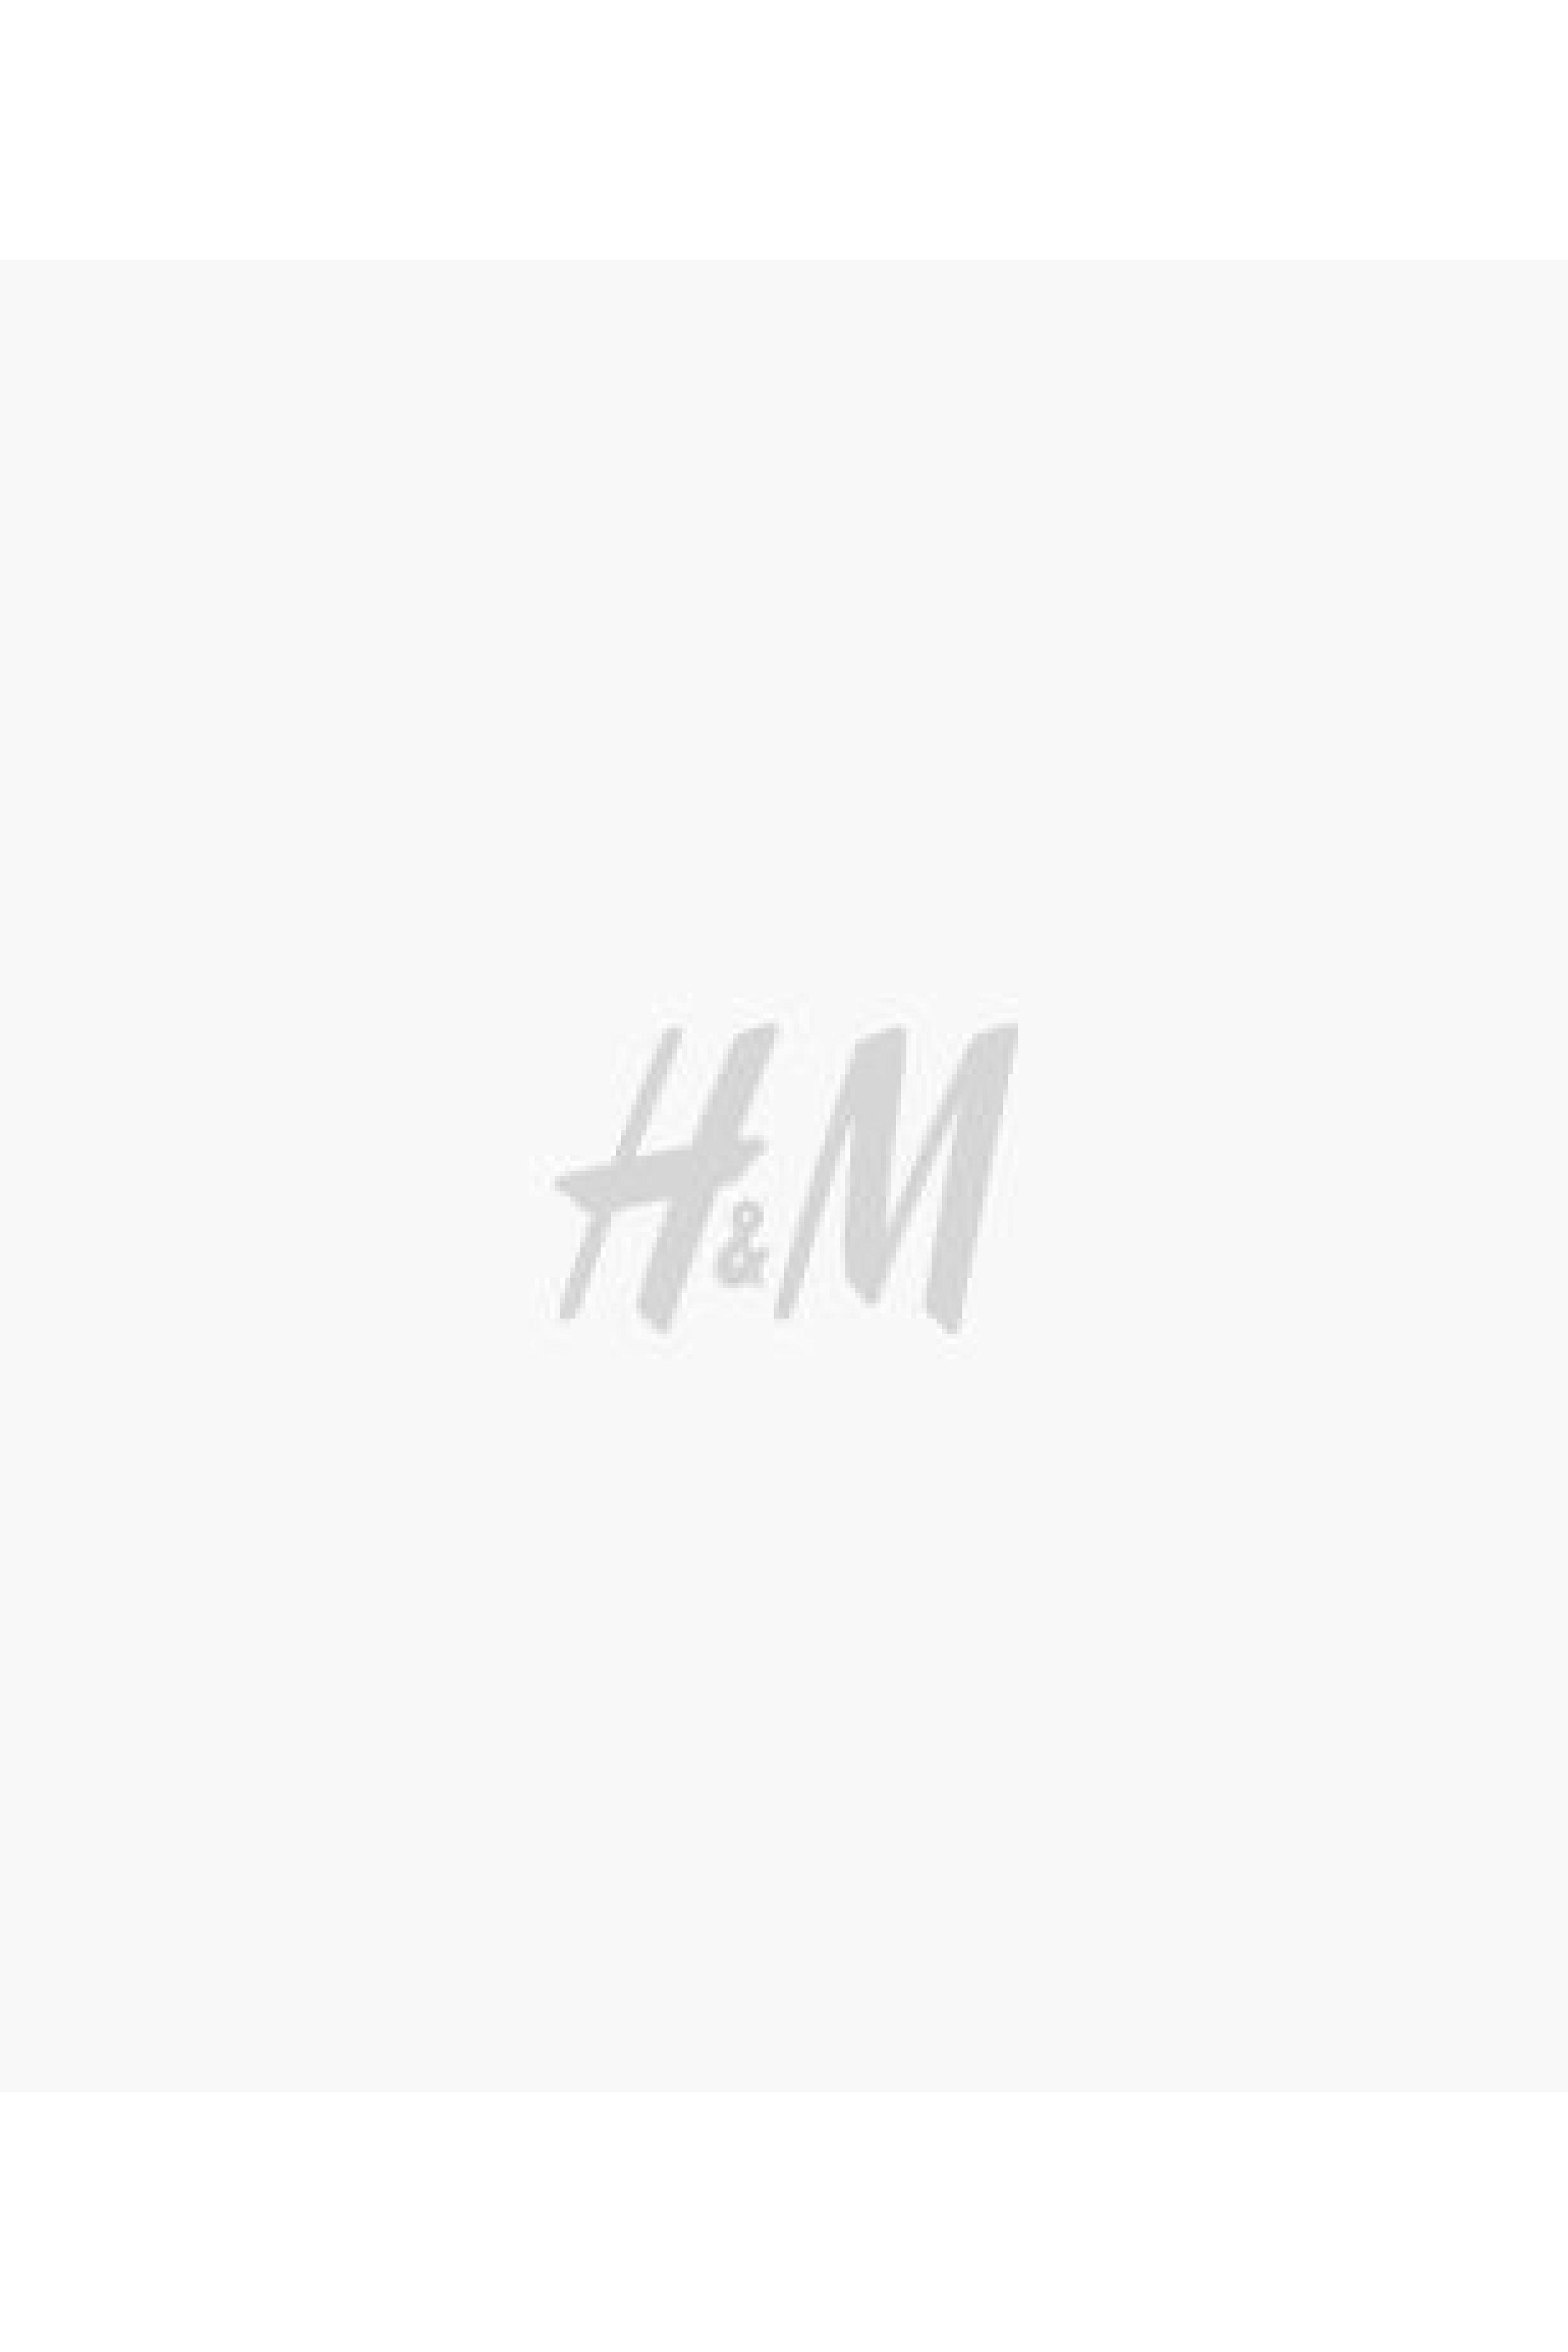 Stripe Jute Laundry Basket, H&M